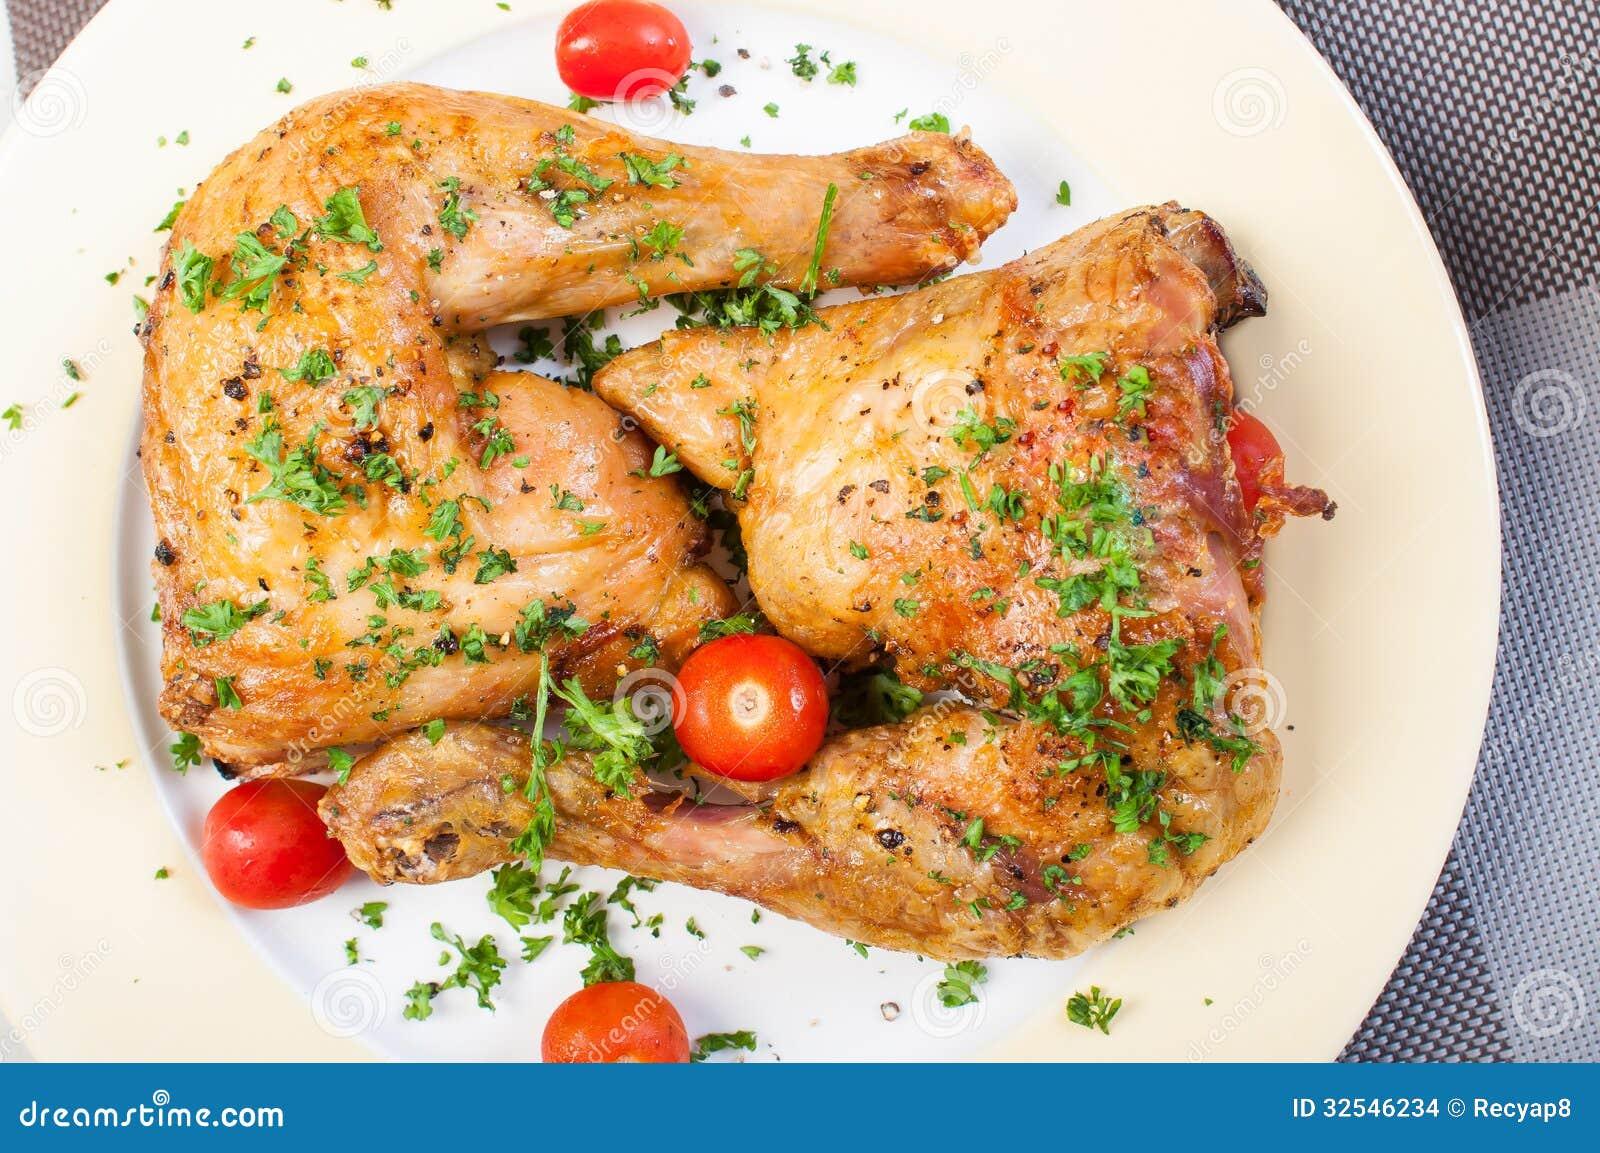 Crispy Roasted Chicken Quarter Stock Images - Image: 32546234